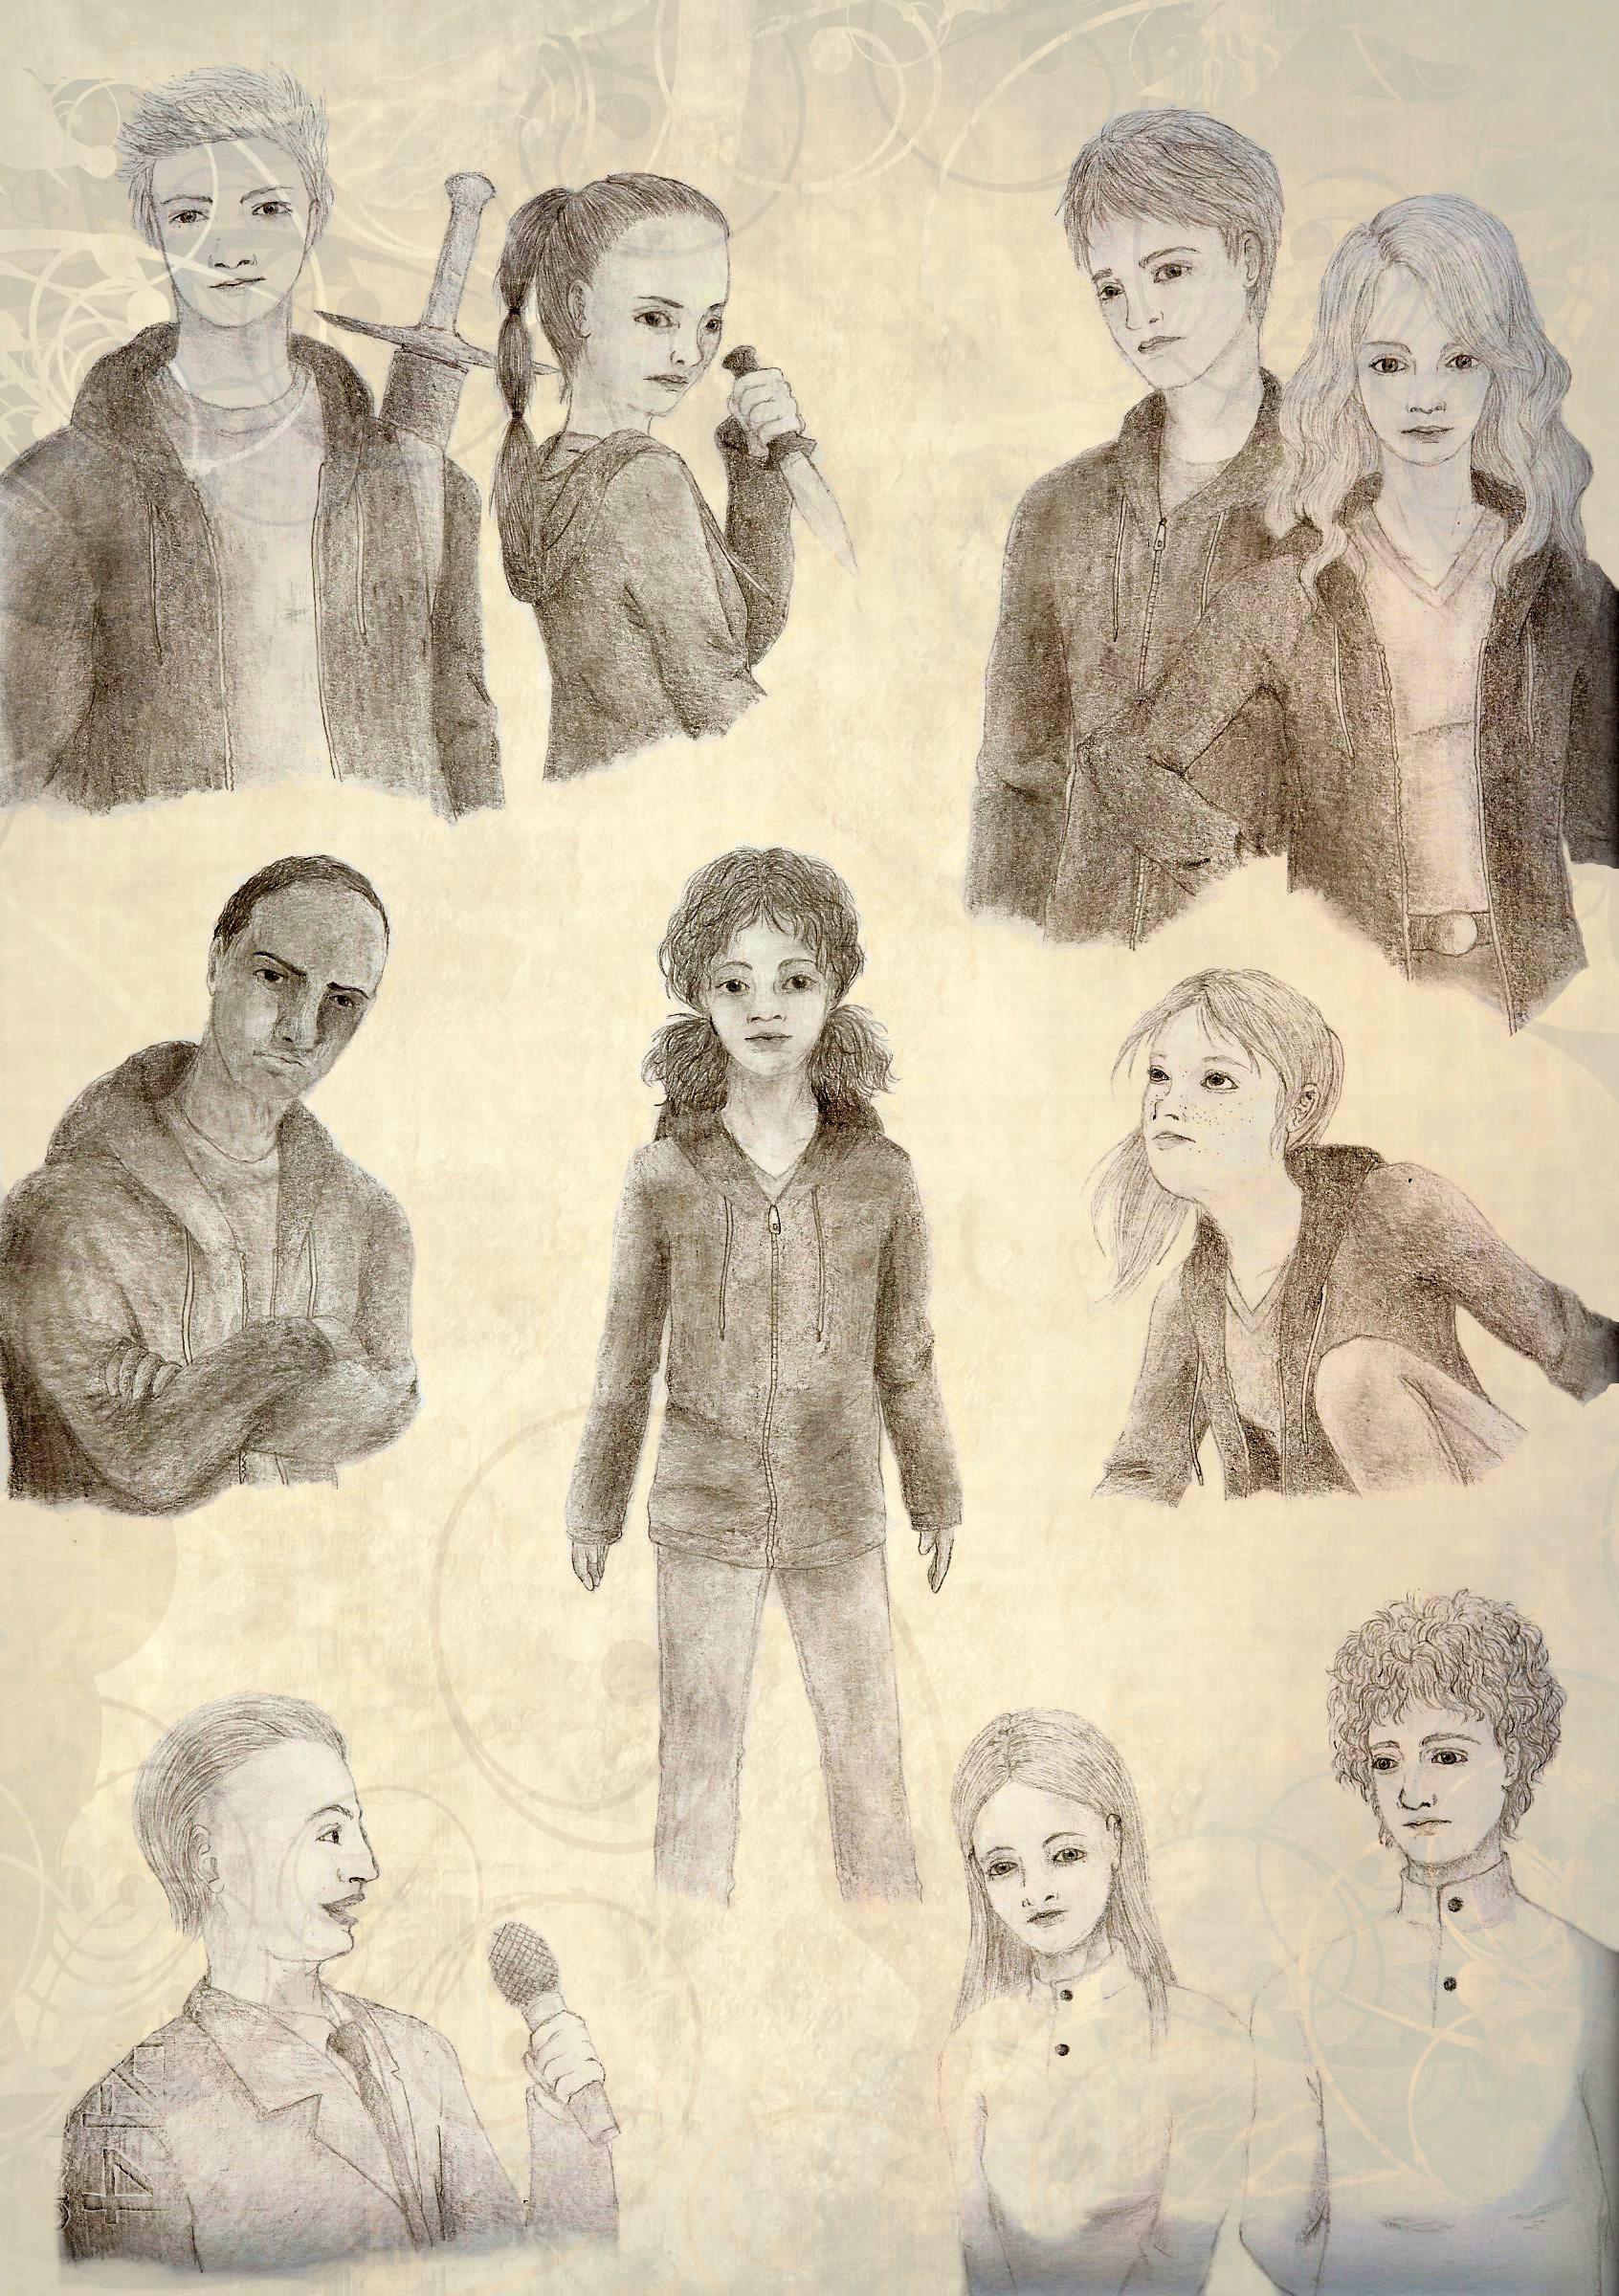 The Hunger Games: sheet 2 by Orikeel on DeviantArt